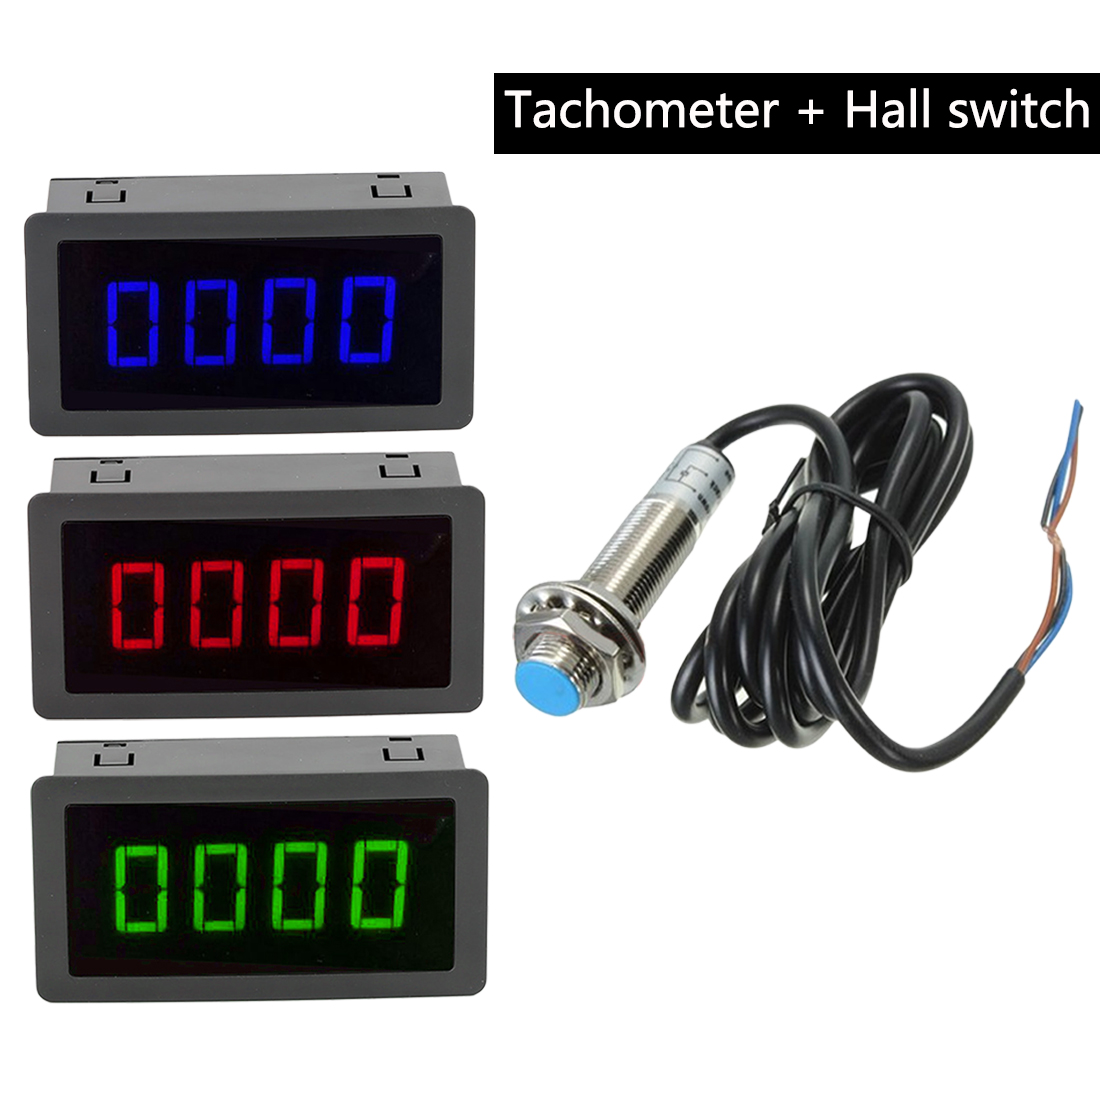 Inductive Proximity Sensor 12v G Digital LED Speedometer Tachometer 9999rpm